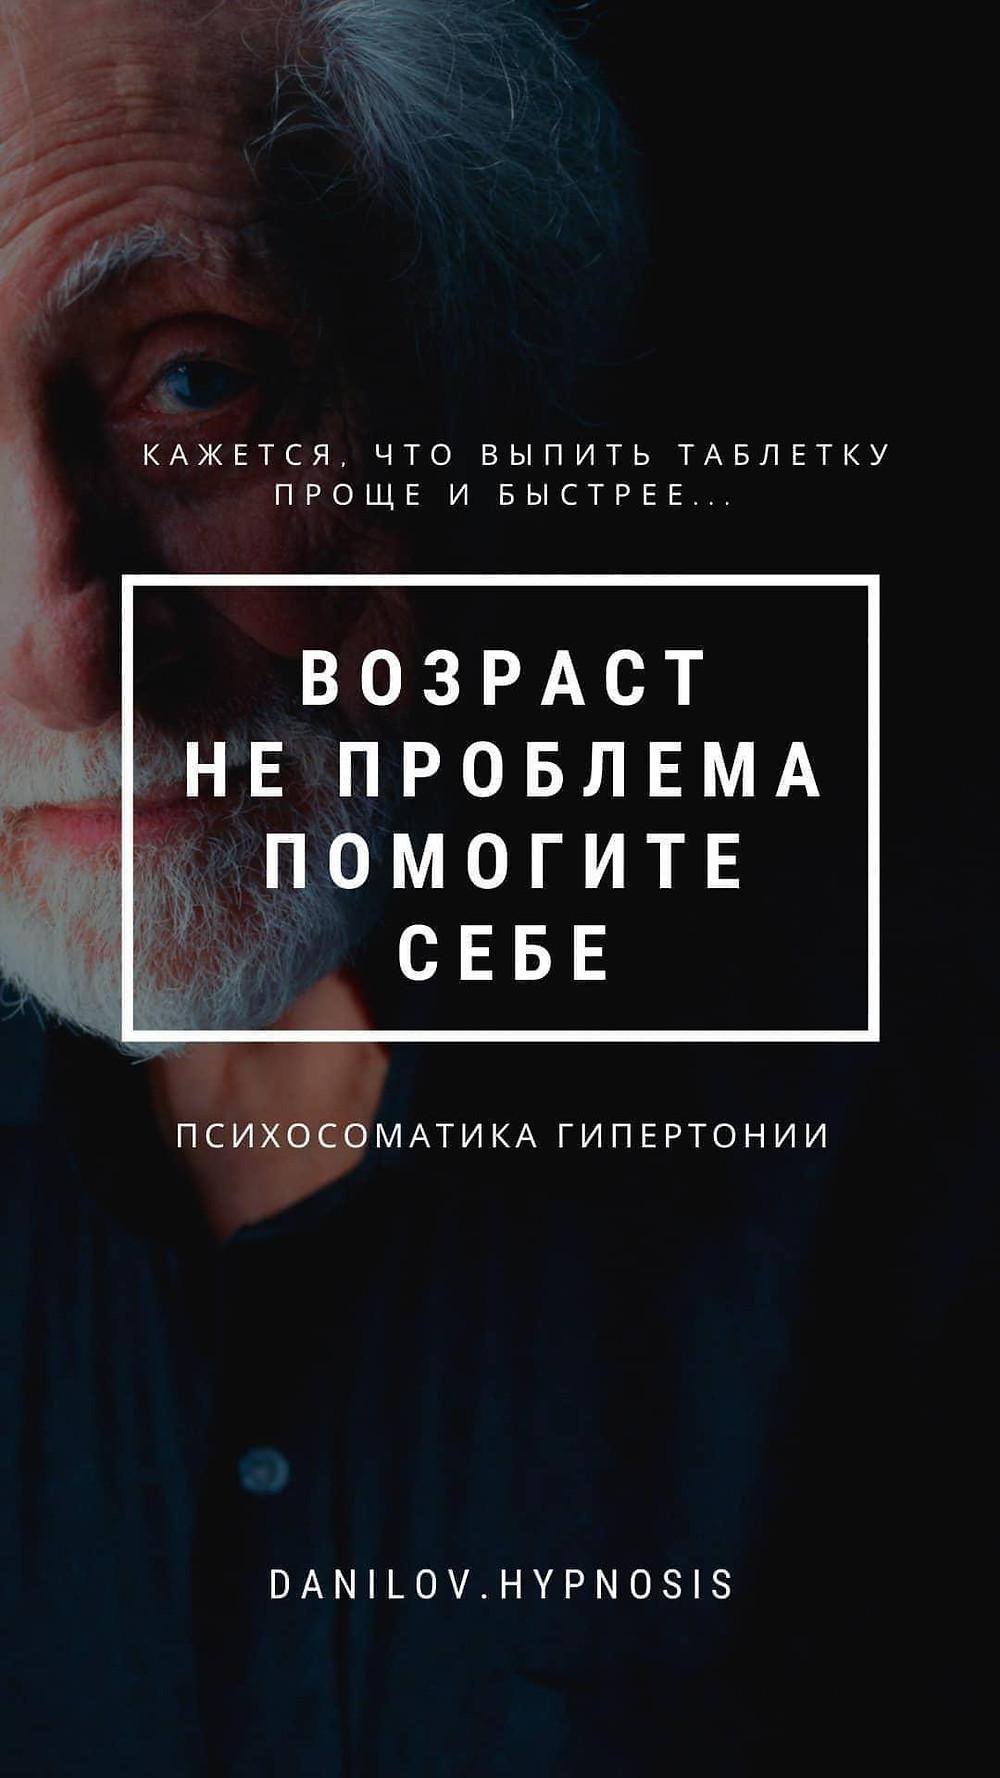 "<img src=""smmstudioangelskui.jpg"" alt=""гипнотерапевт Данилов Василий г. Москва"">"